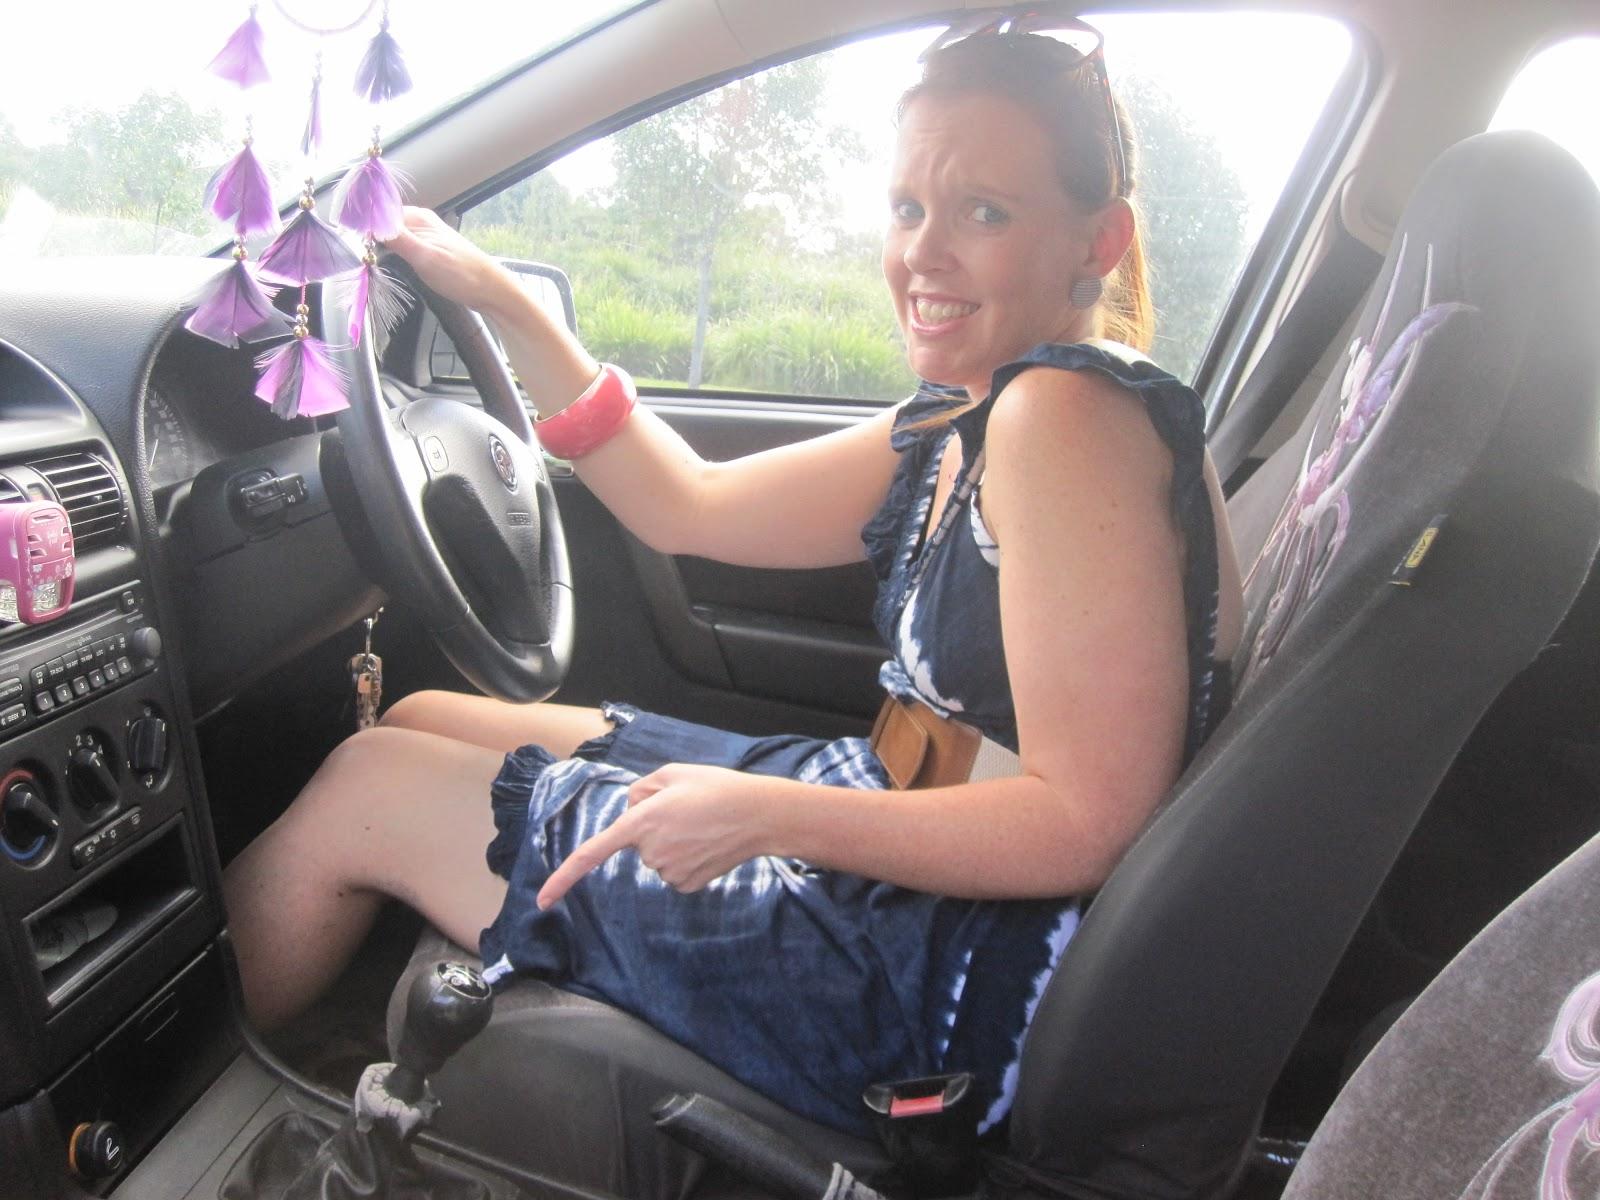 Manual Car Driving Lessons Pdf